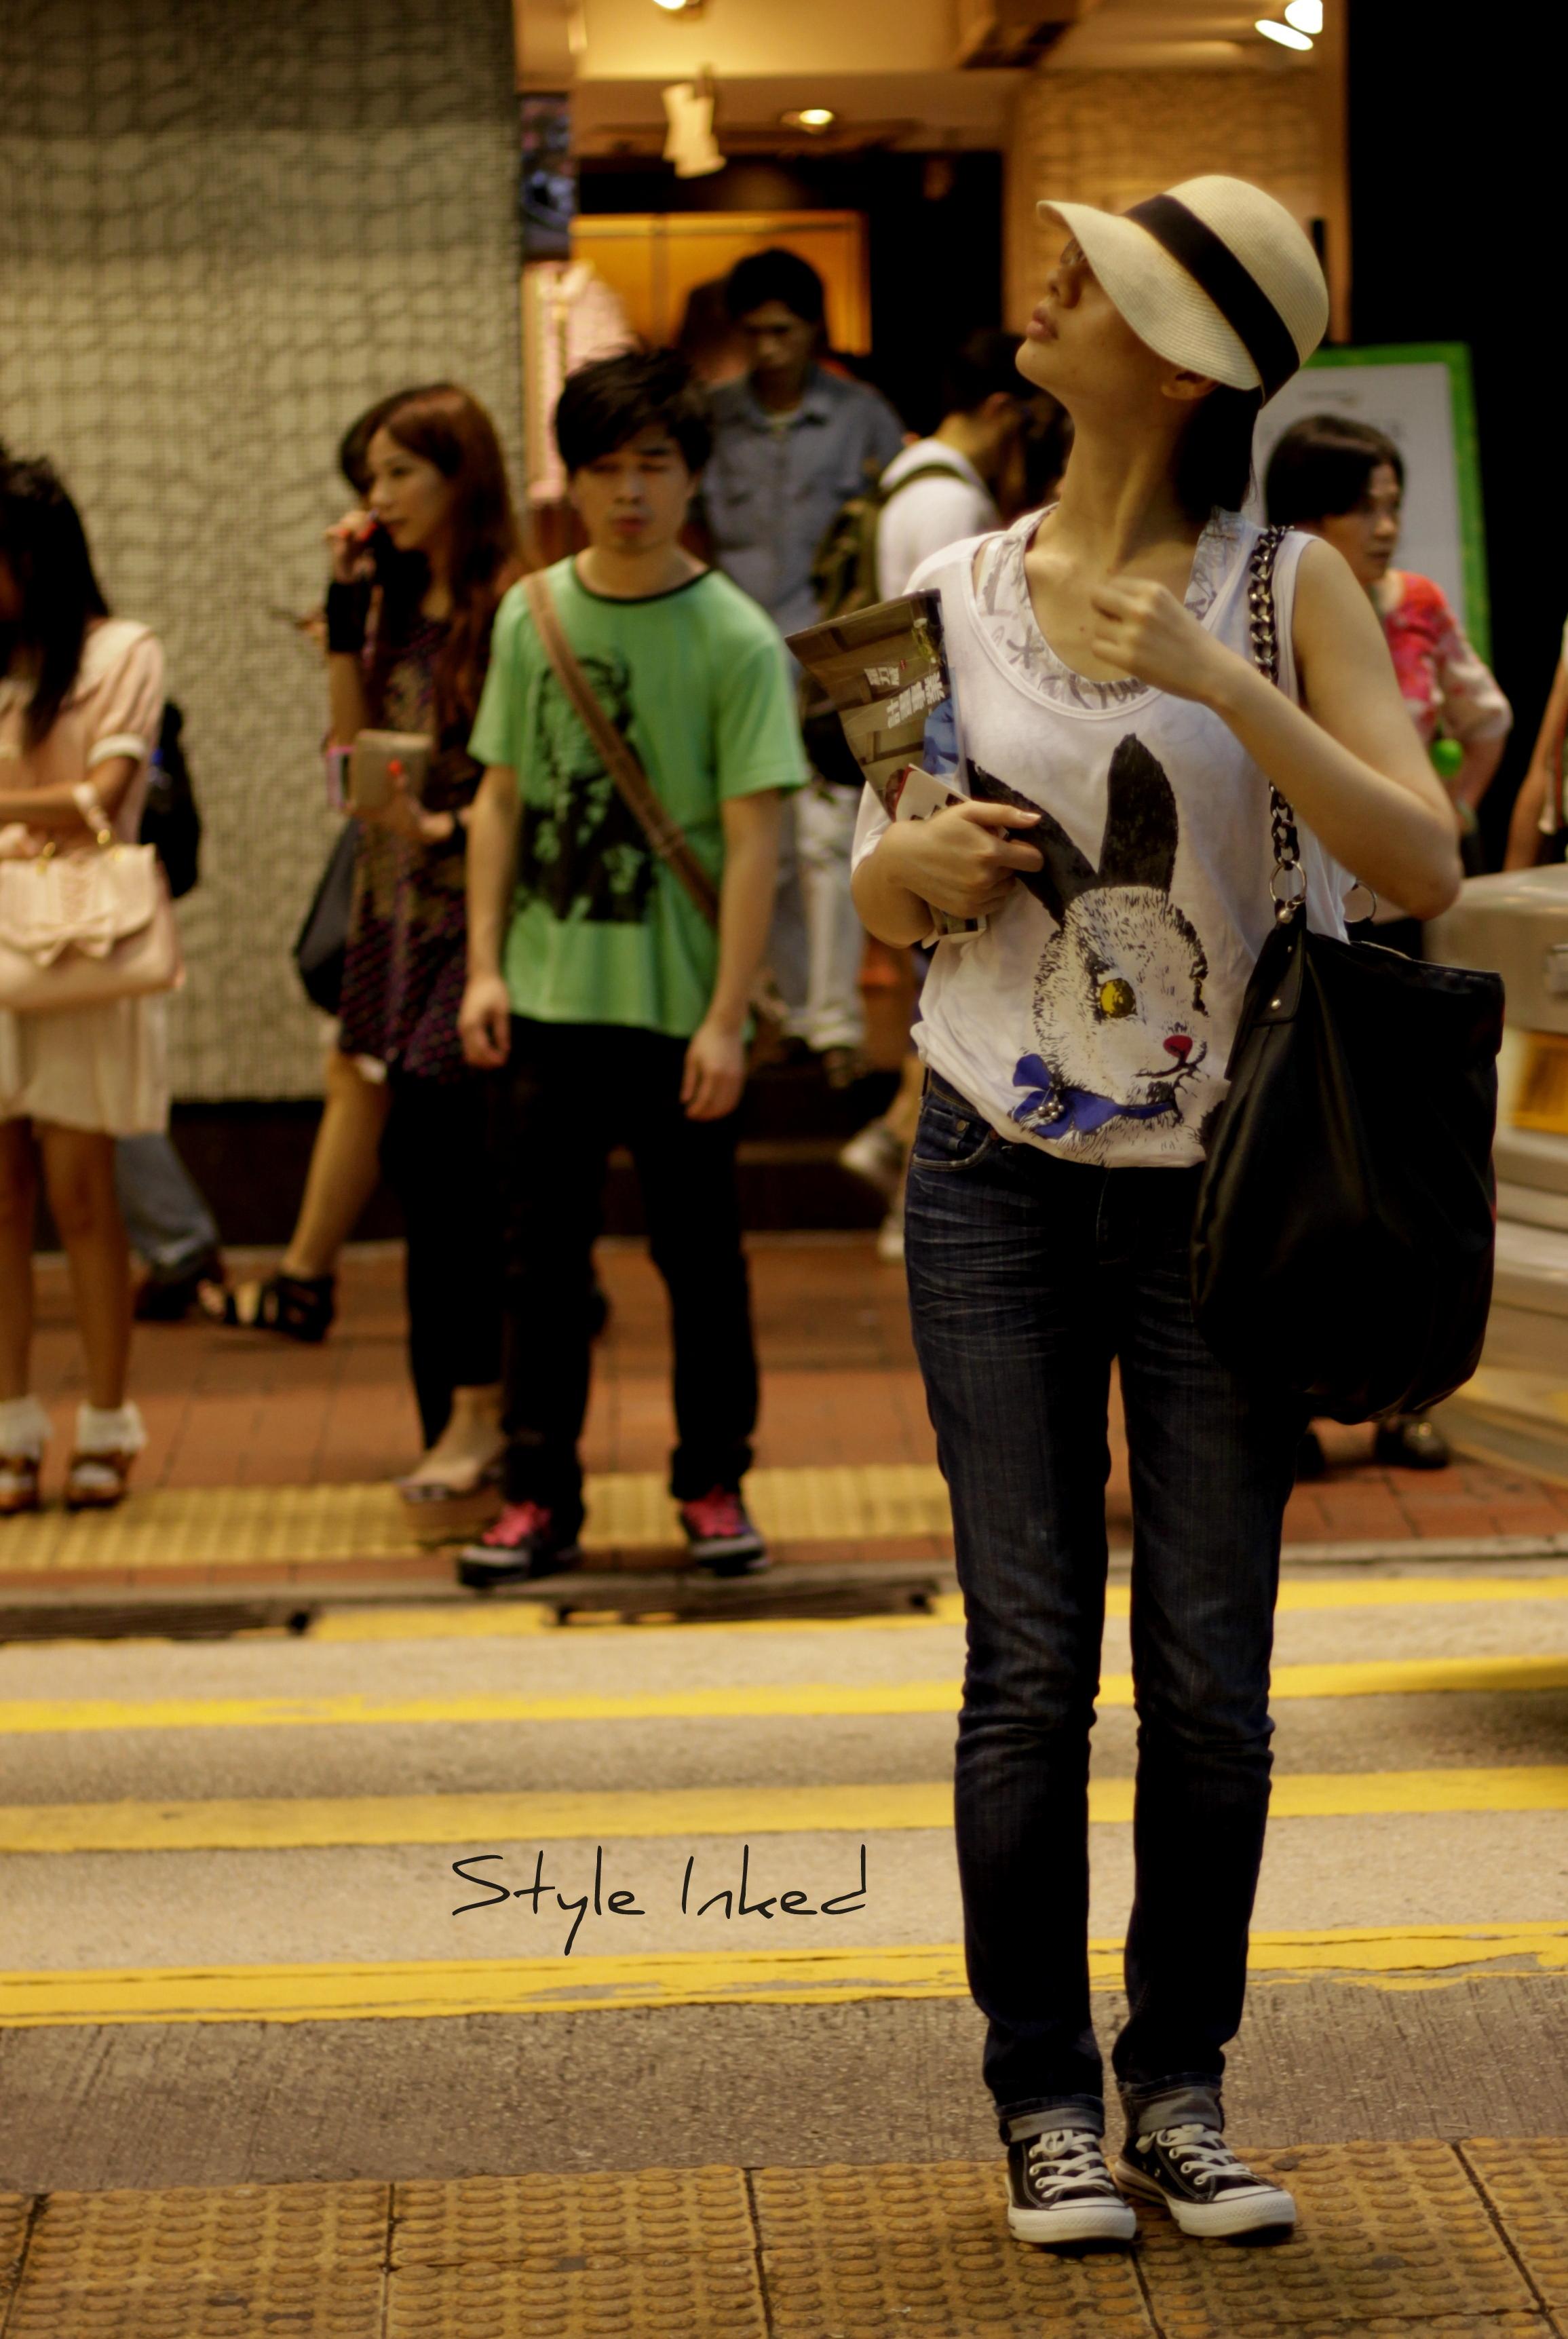 Hong Kong Street Fashion  Style Inked